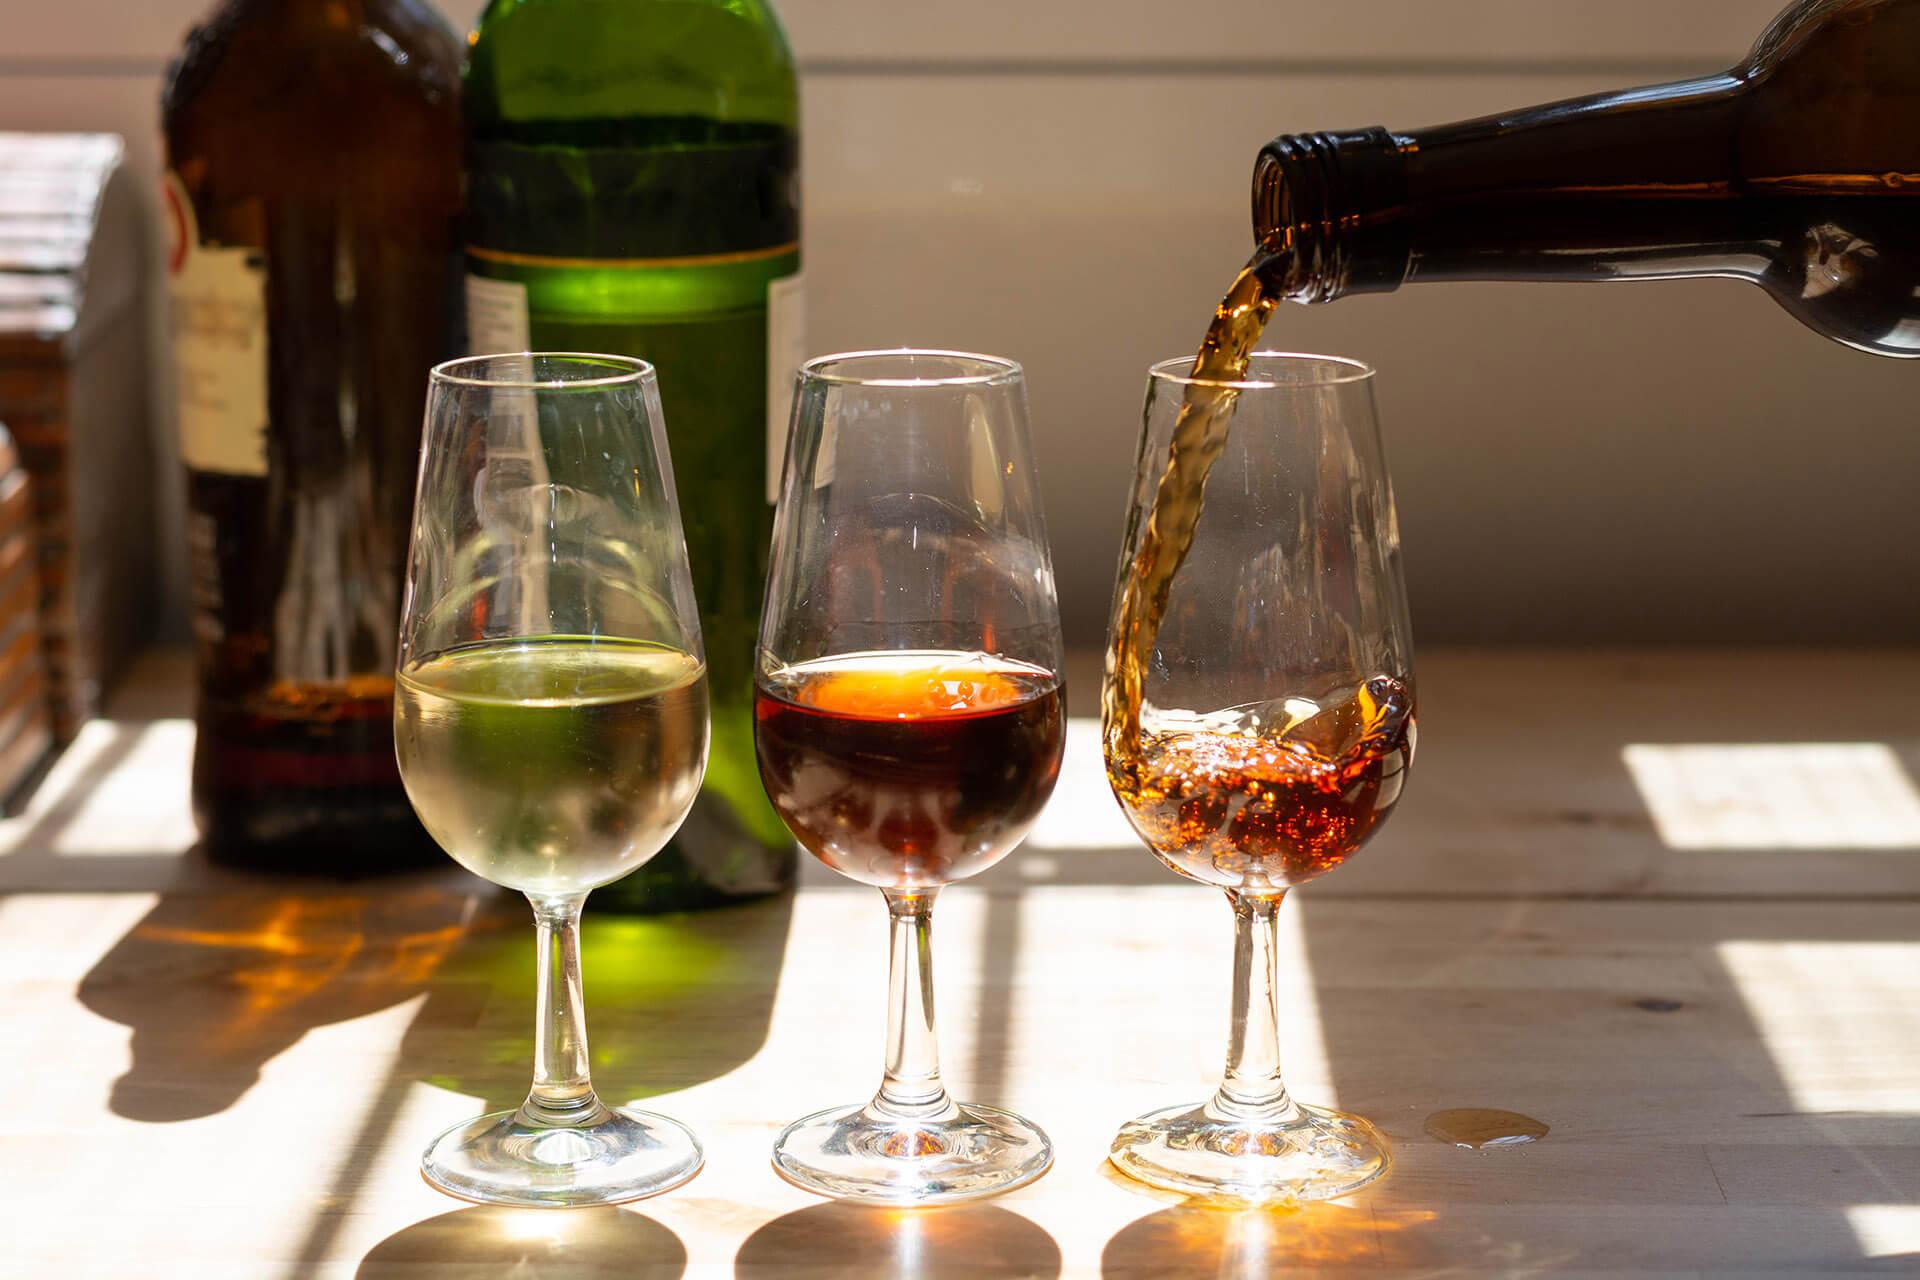 Vang cường hóa (Fortified Wine)